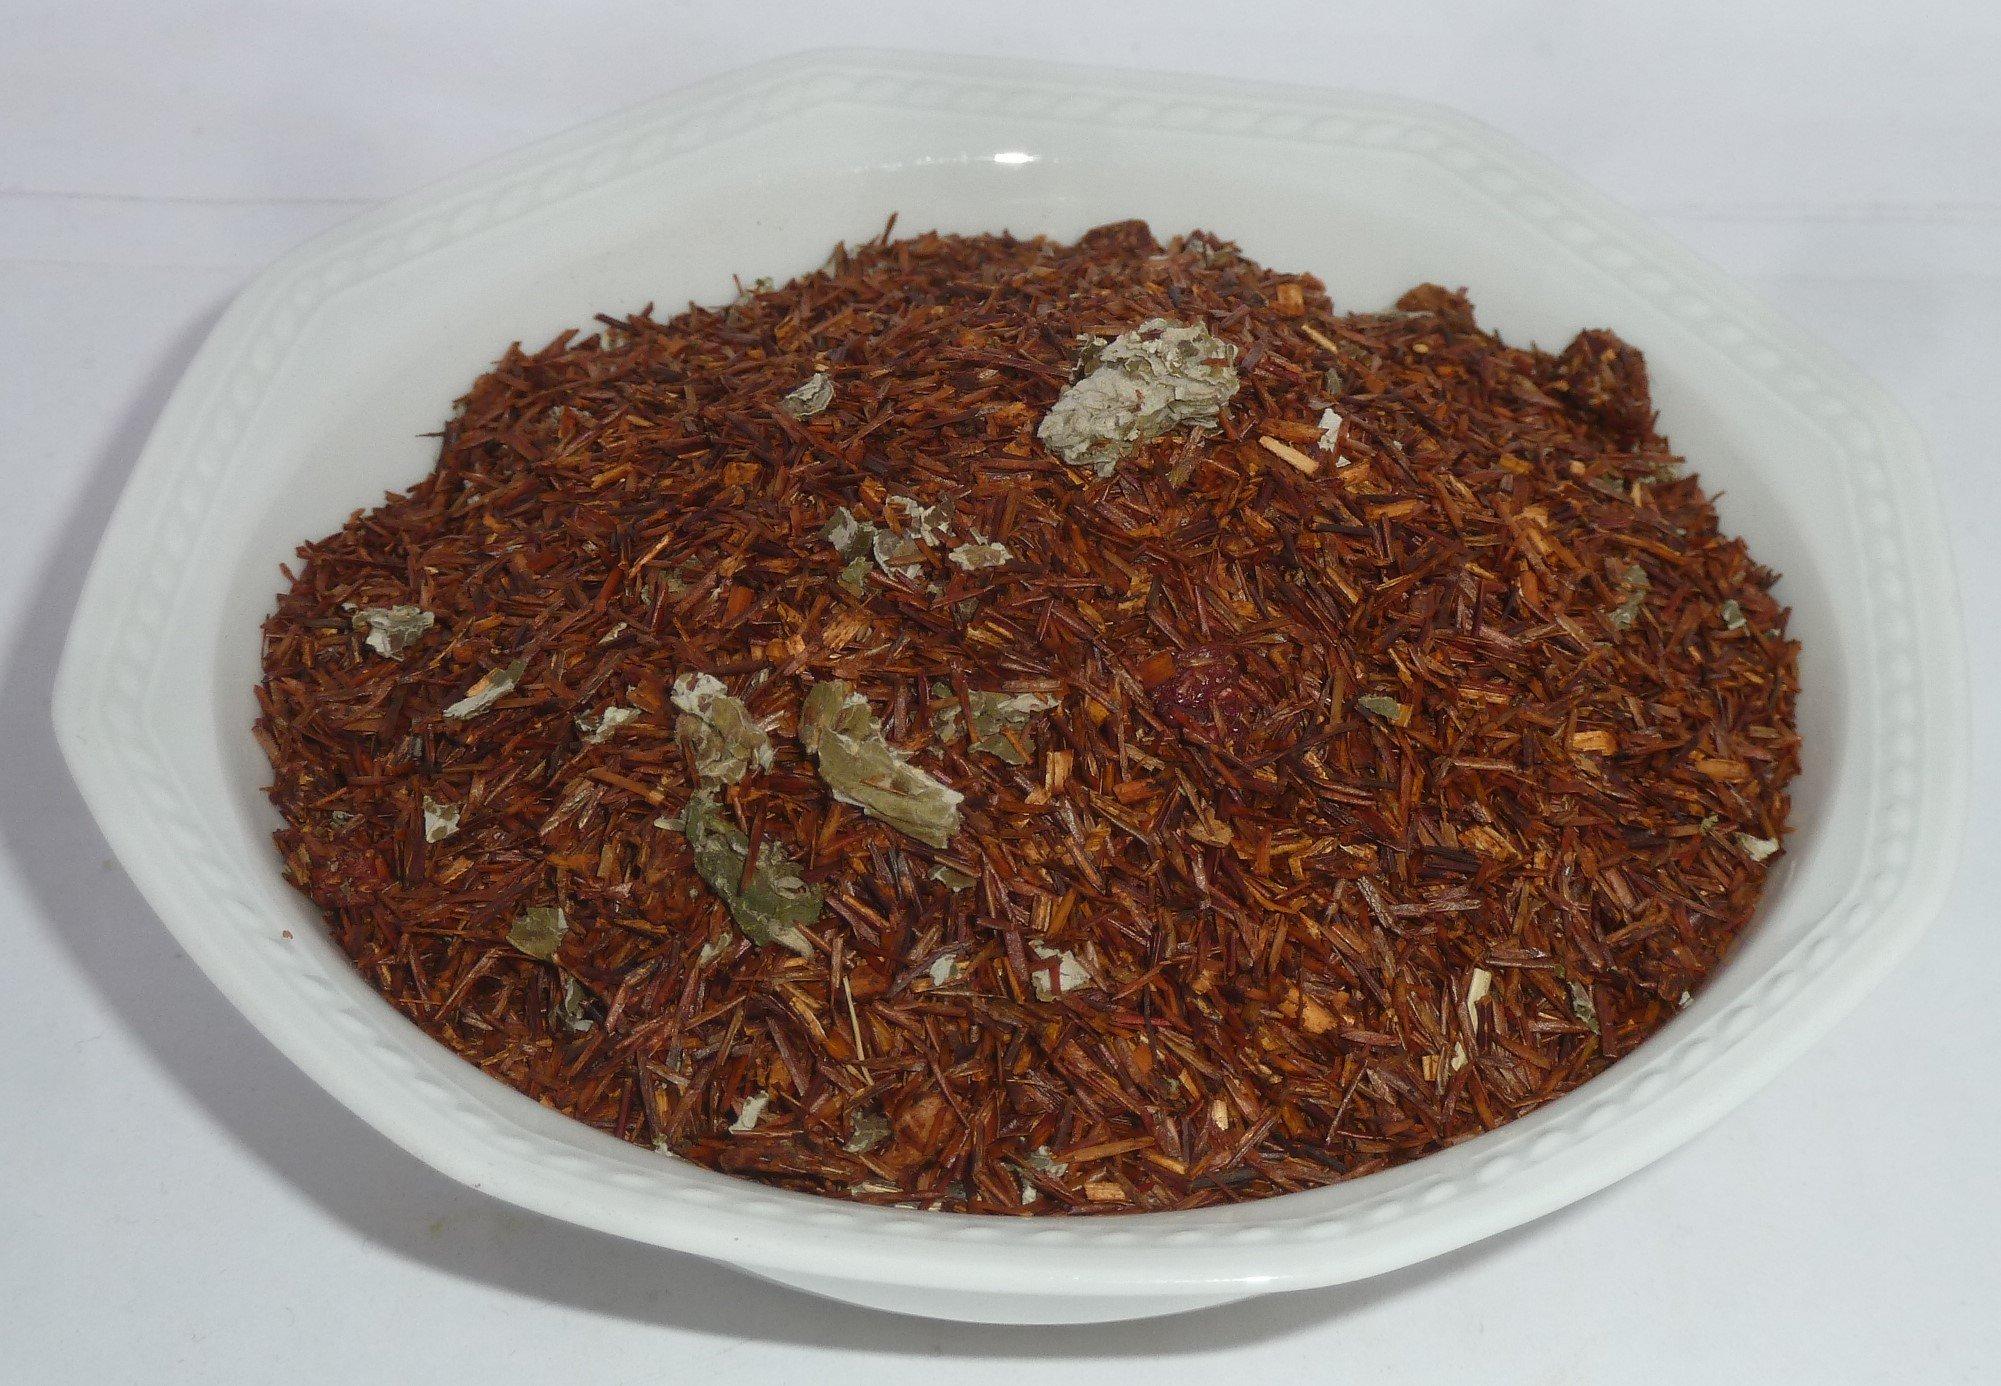 Erdbeer-Milchshake-Rotbusch-Rooibos-Tee-kbA-Qualitt